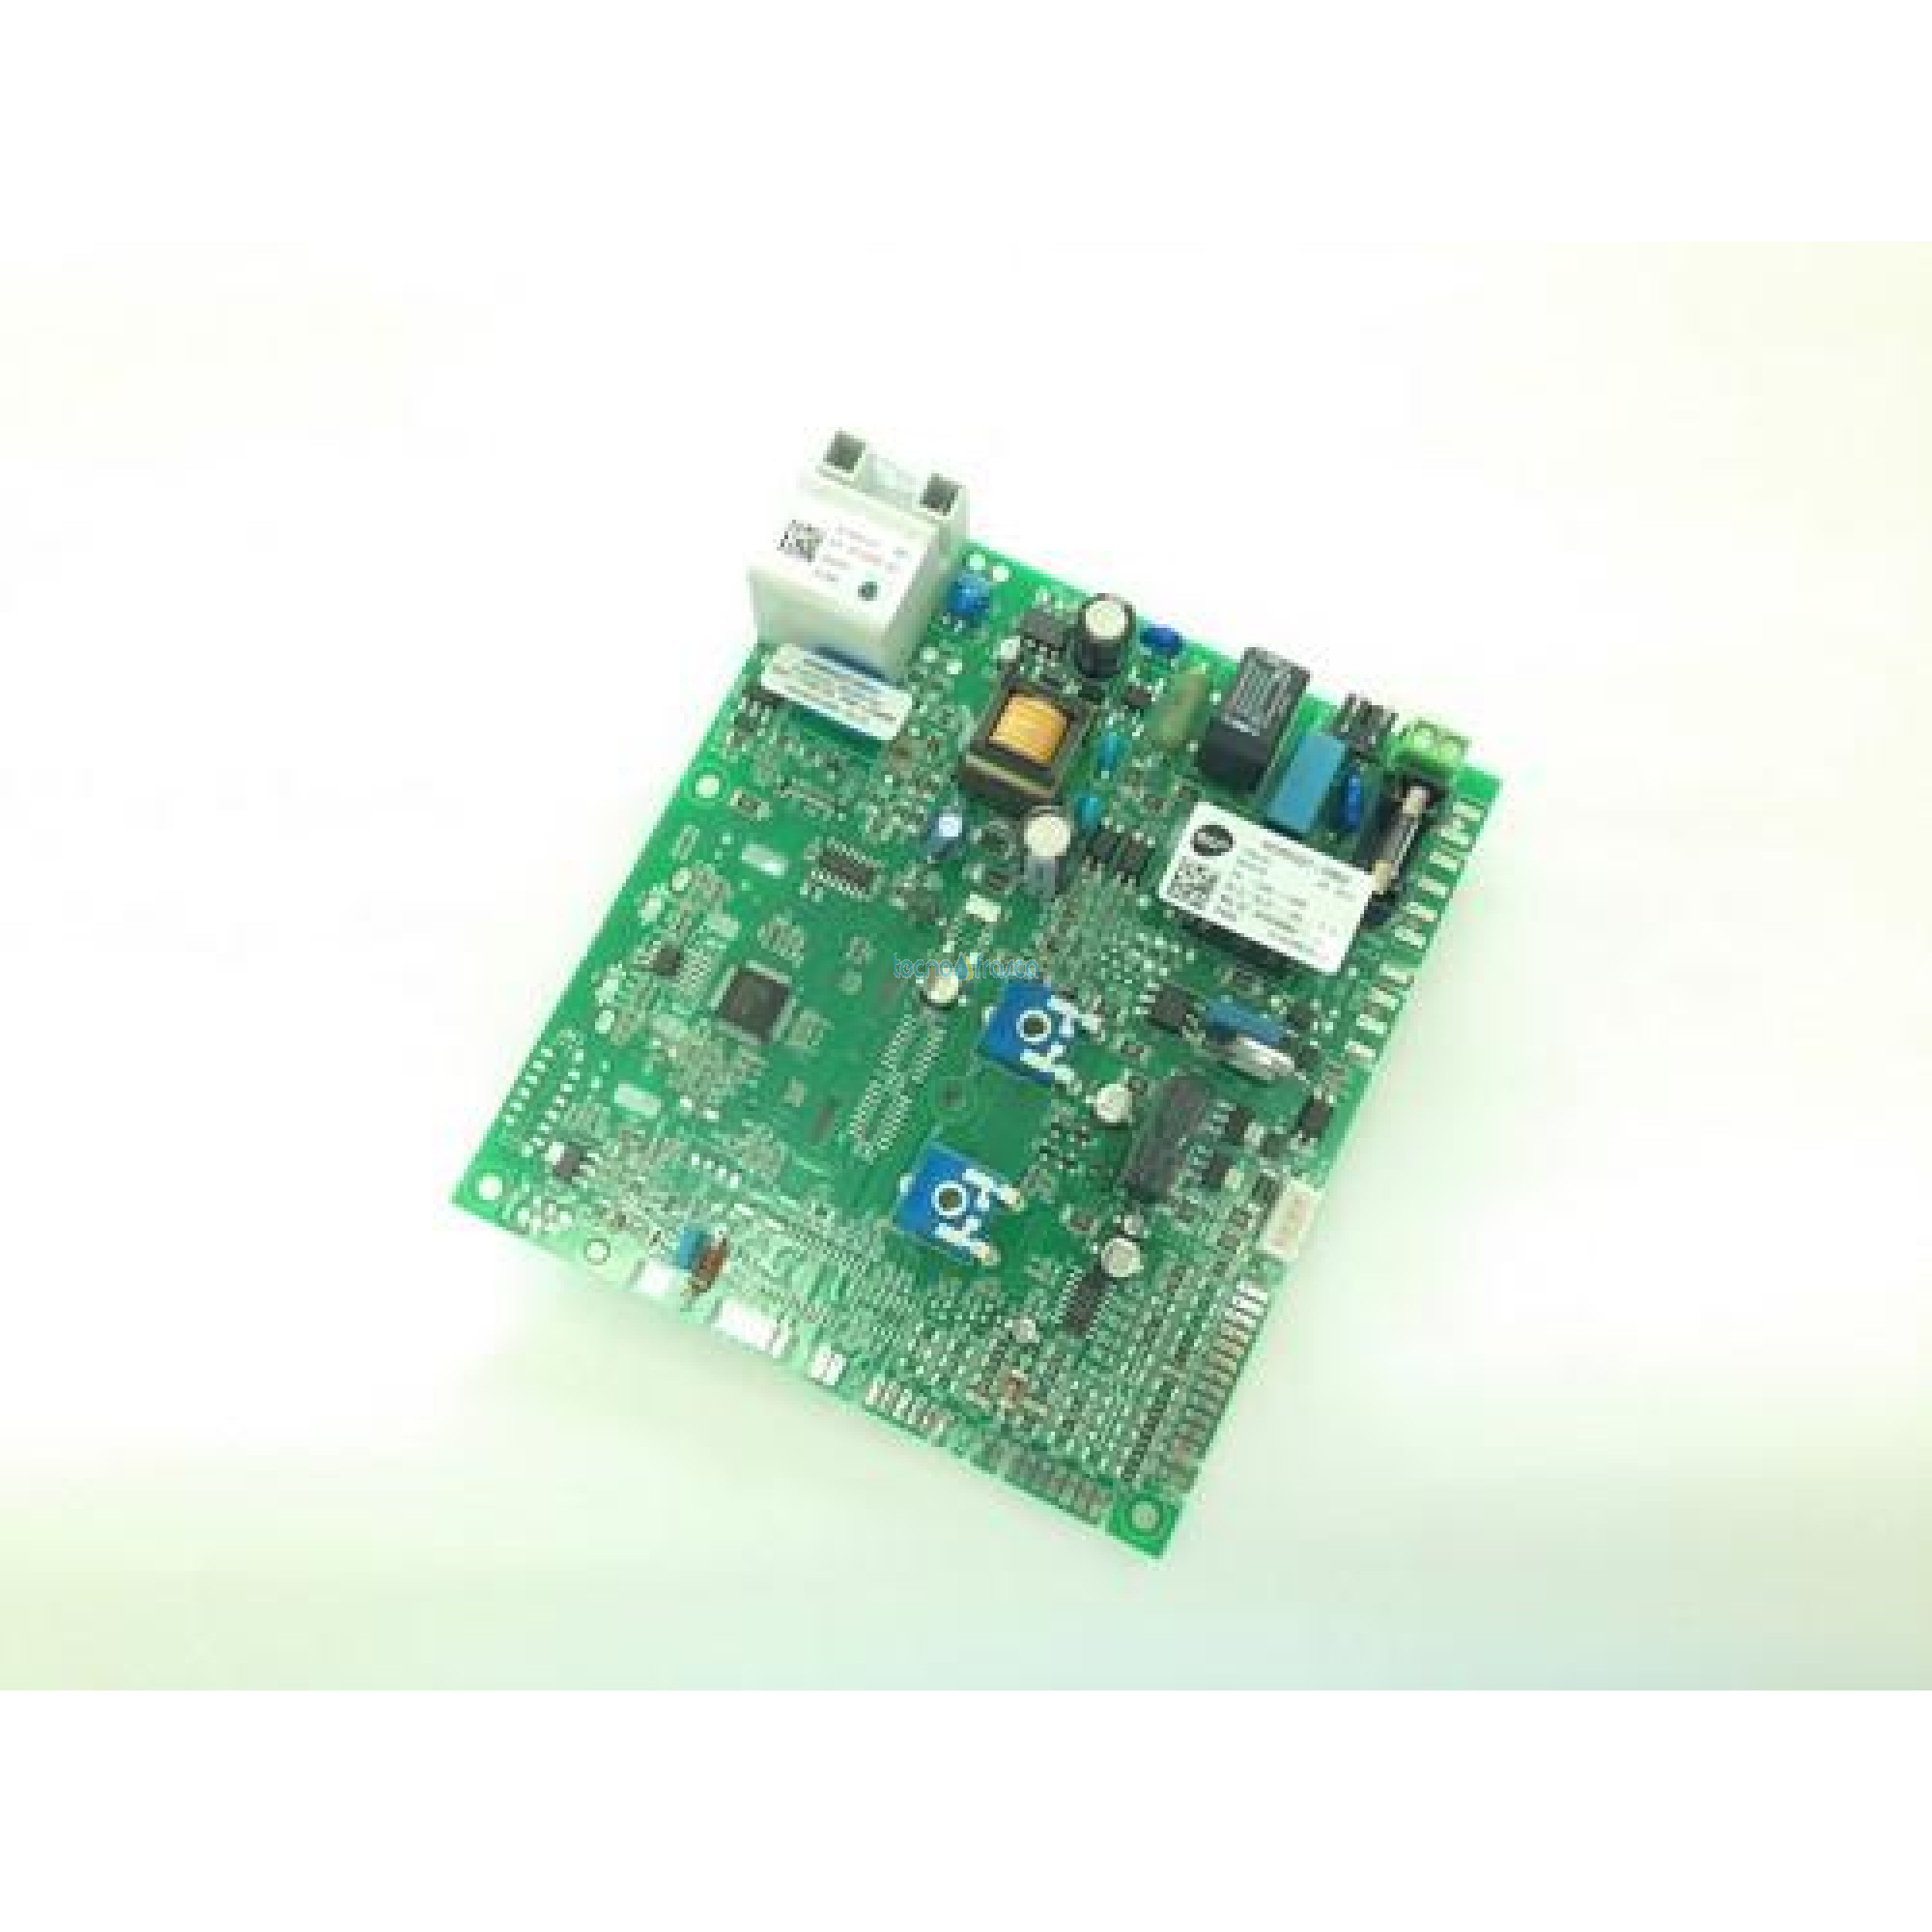 Sime scheda elettronica 6324910g